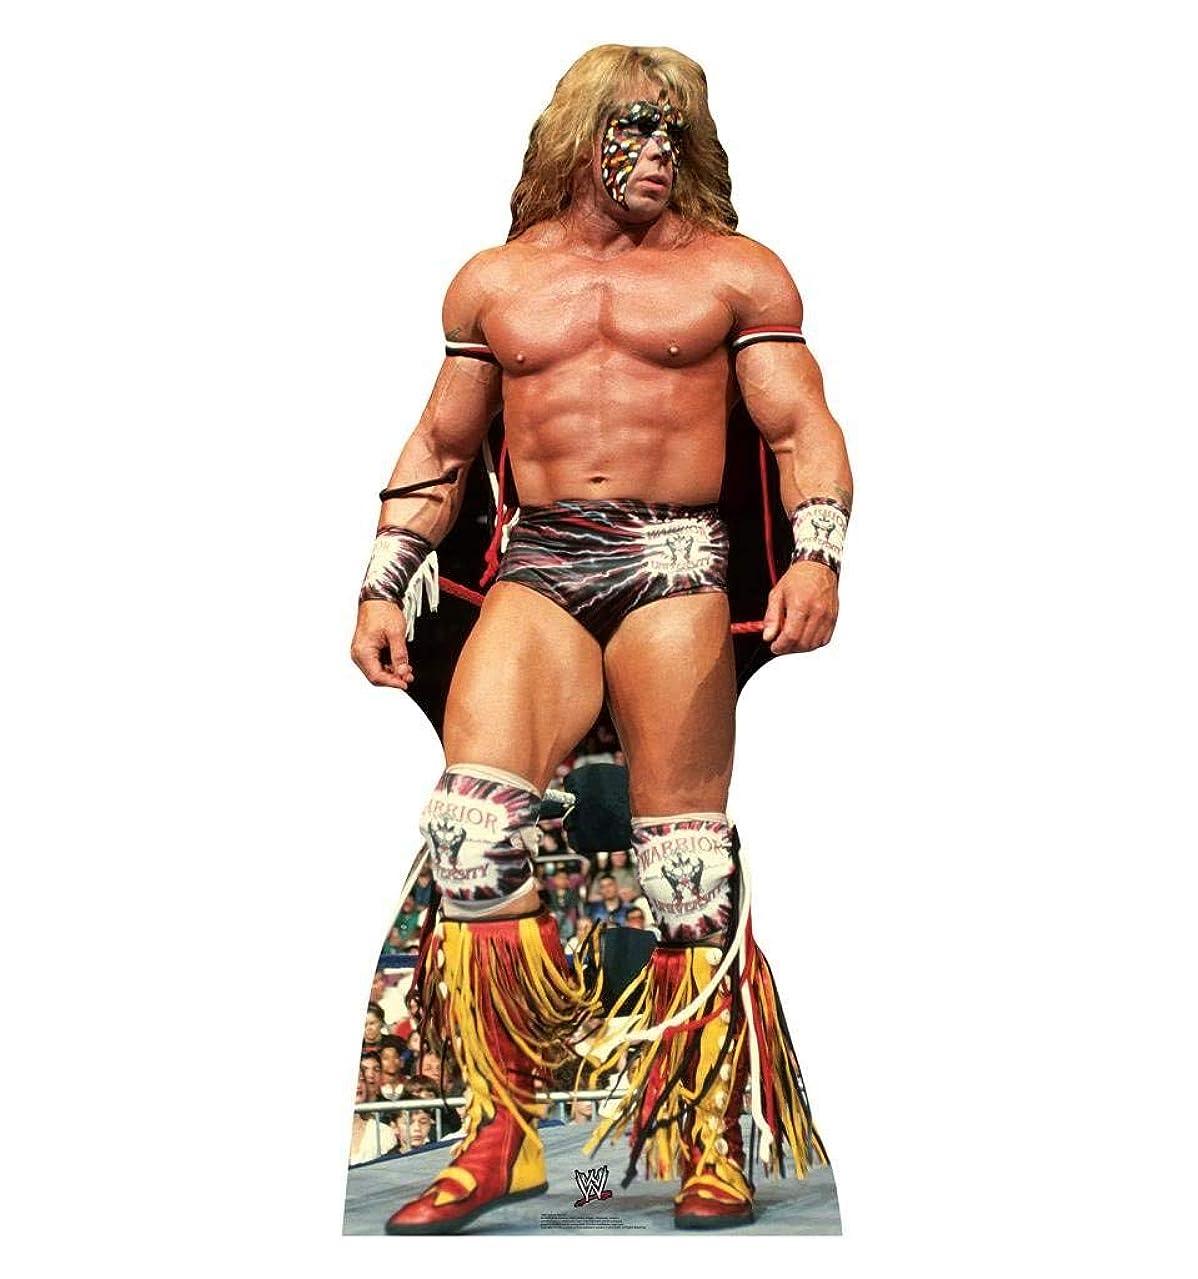 Advanced Graphics Ultimate Warrior Life Size Cardboard Cutout Standup - WWE